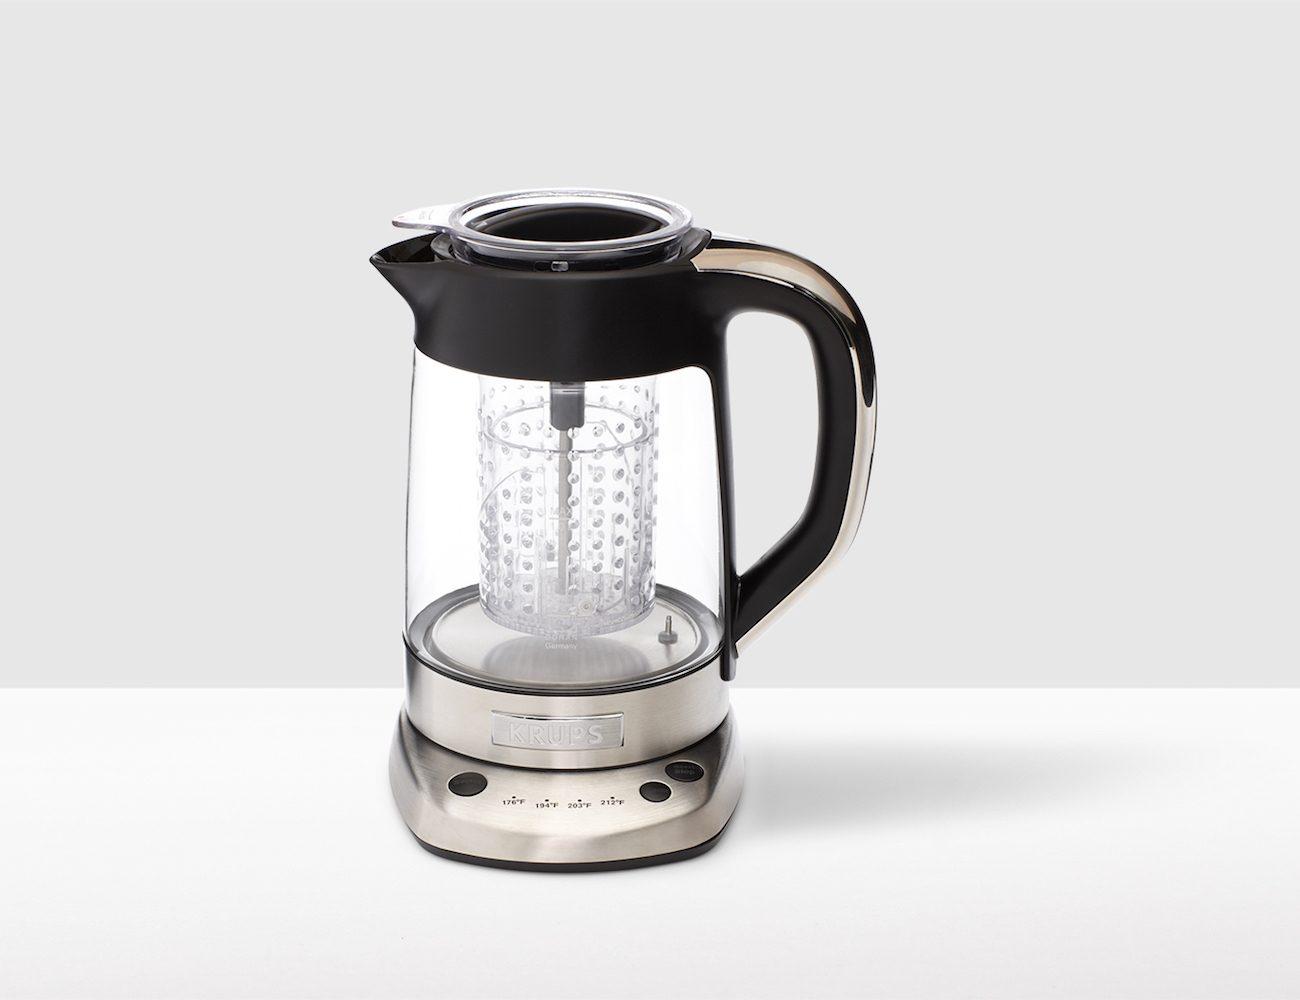 Krups Electric Glass Kettle Tea Infuser 187 Gadget Flow